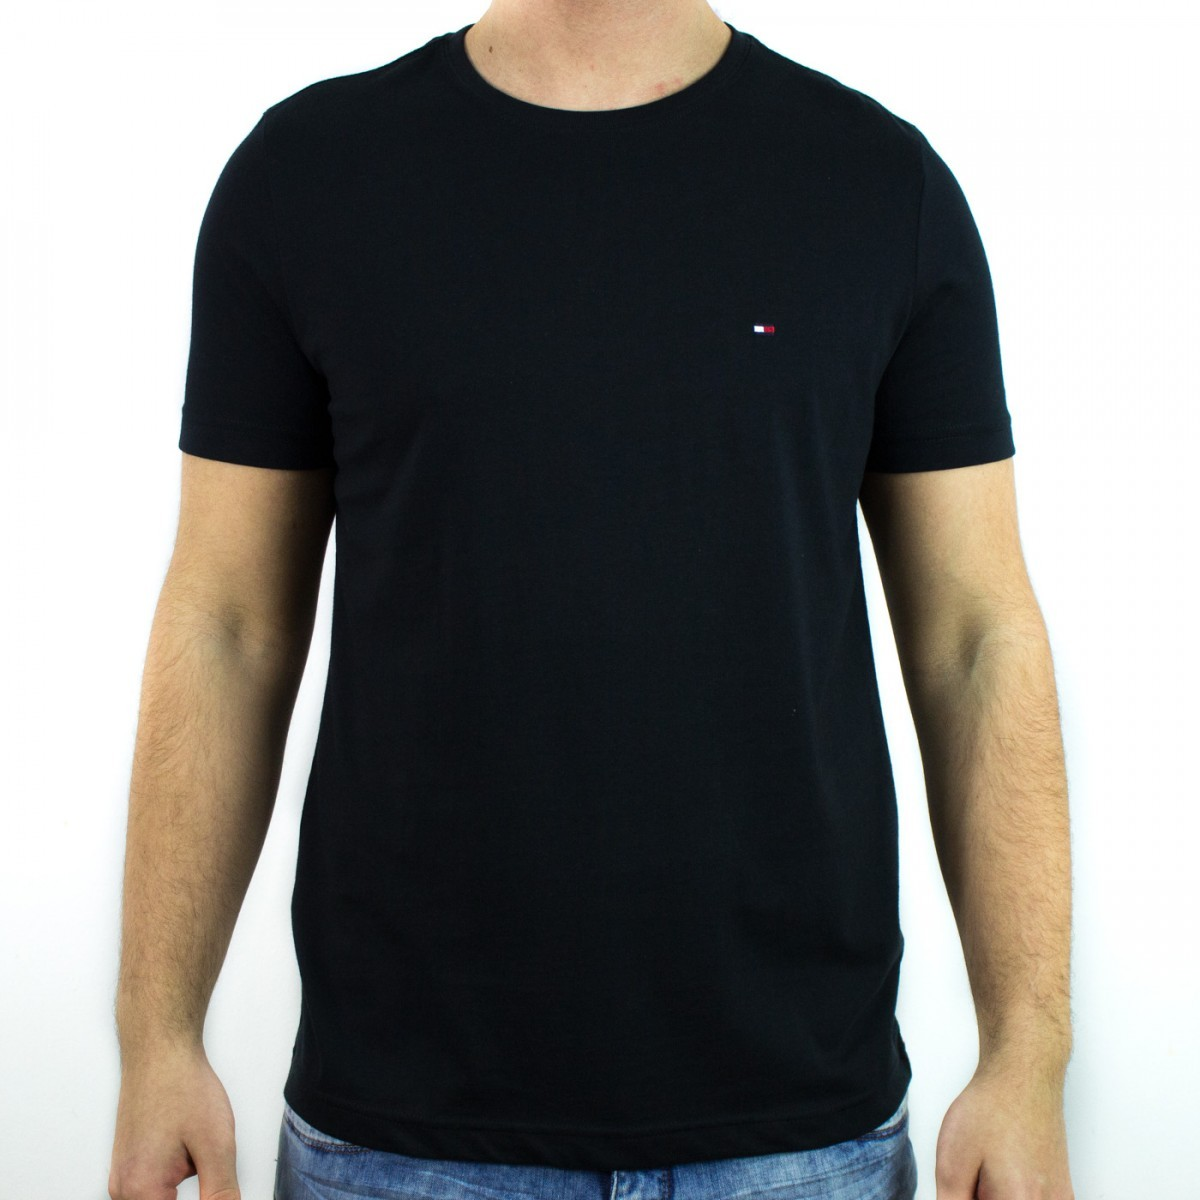 5ea27ae99ef29 Bizz Store - Camiseta Masculina Tommy Hilfiger Manga Curta